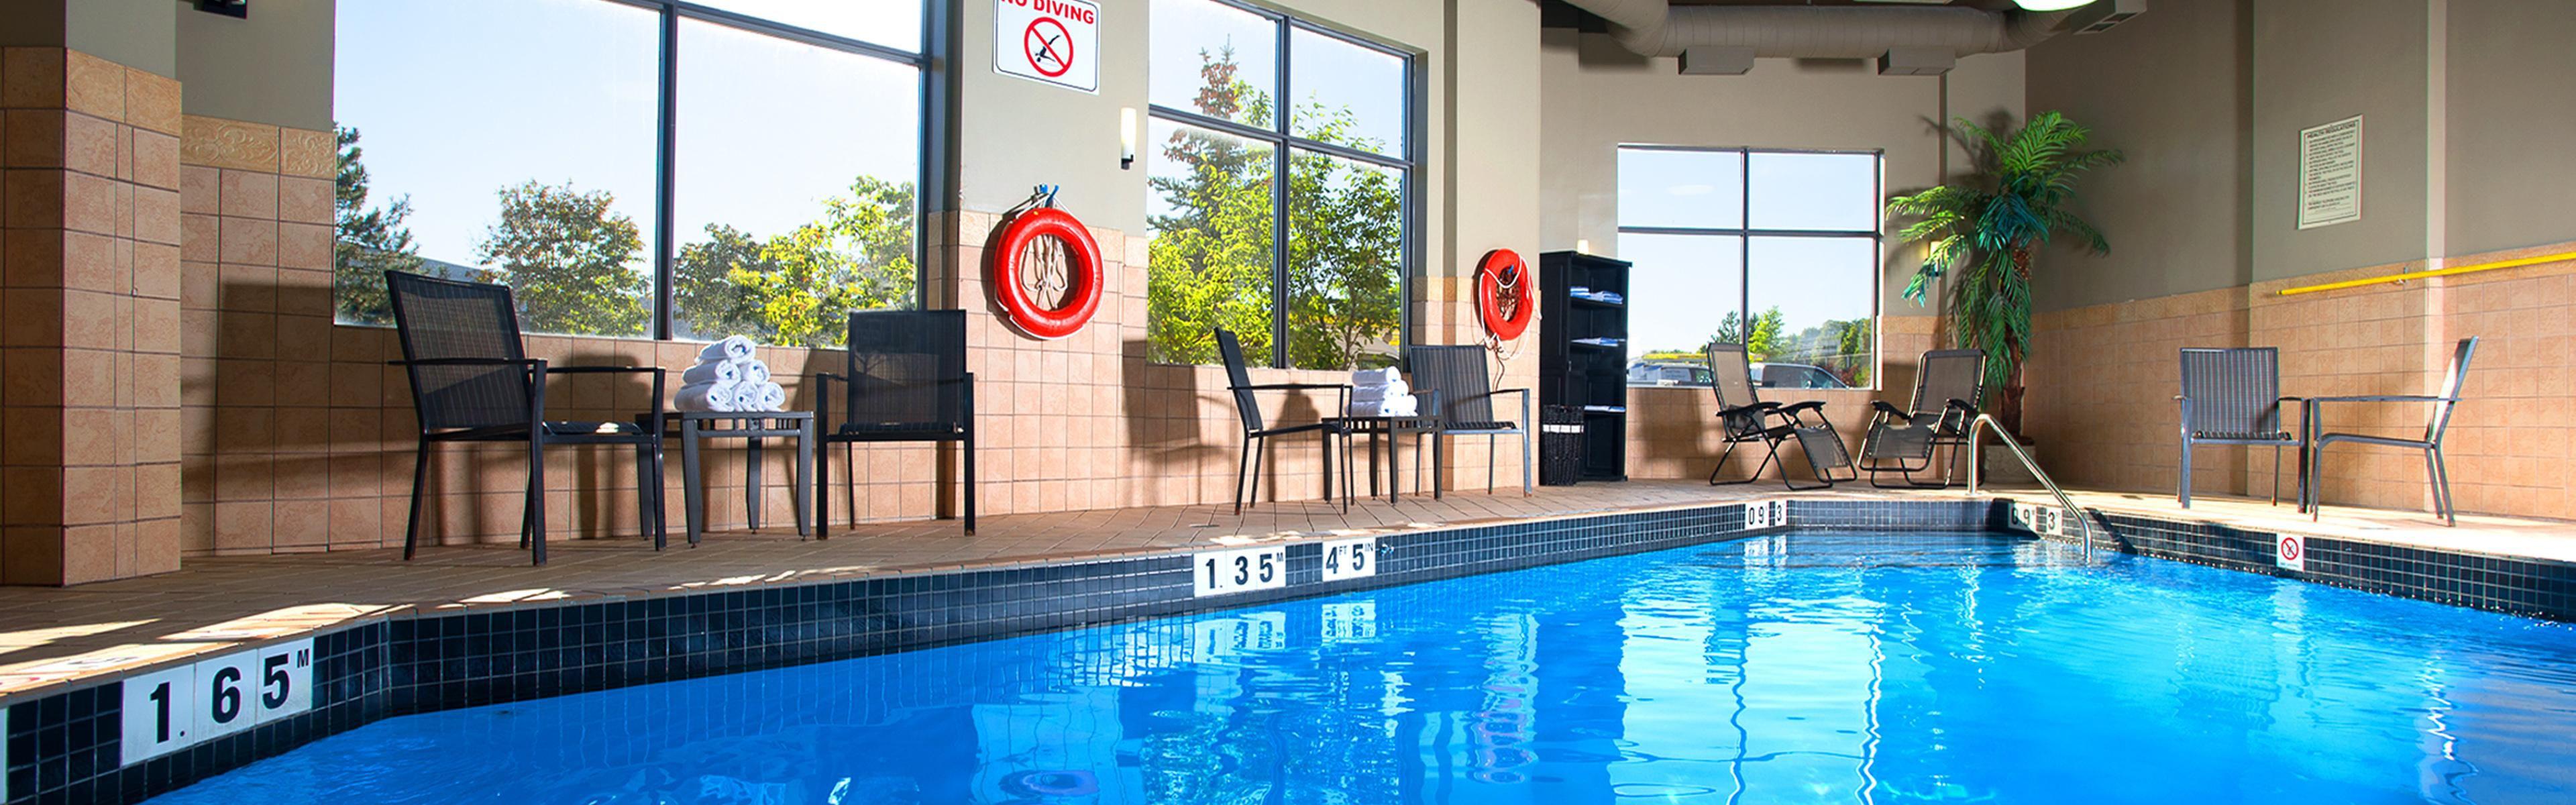 Holiday Inn & Suites Mississauga West - Meadowvale